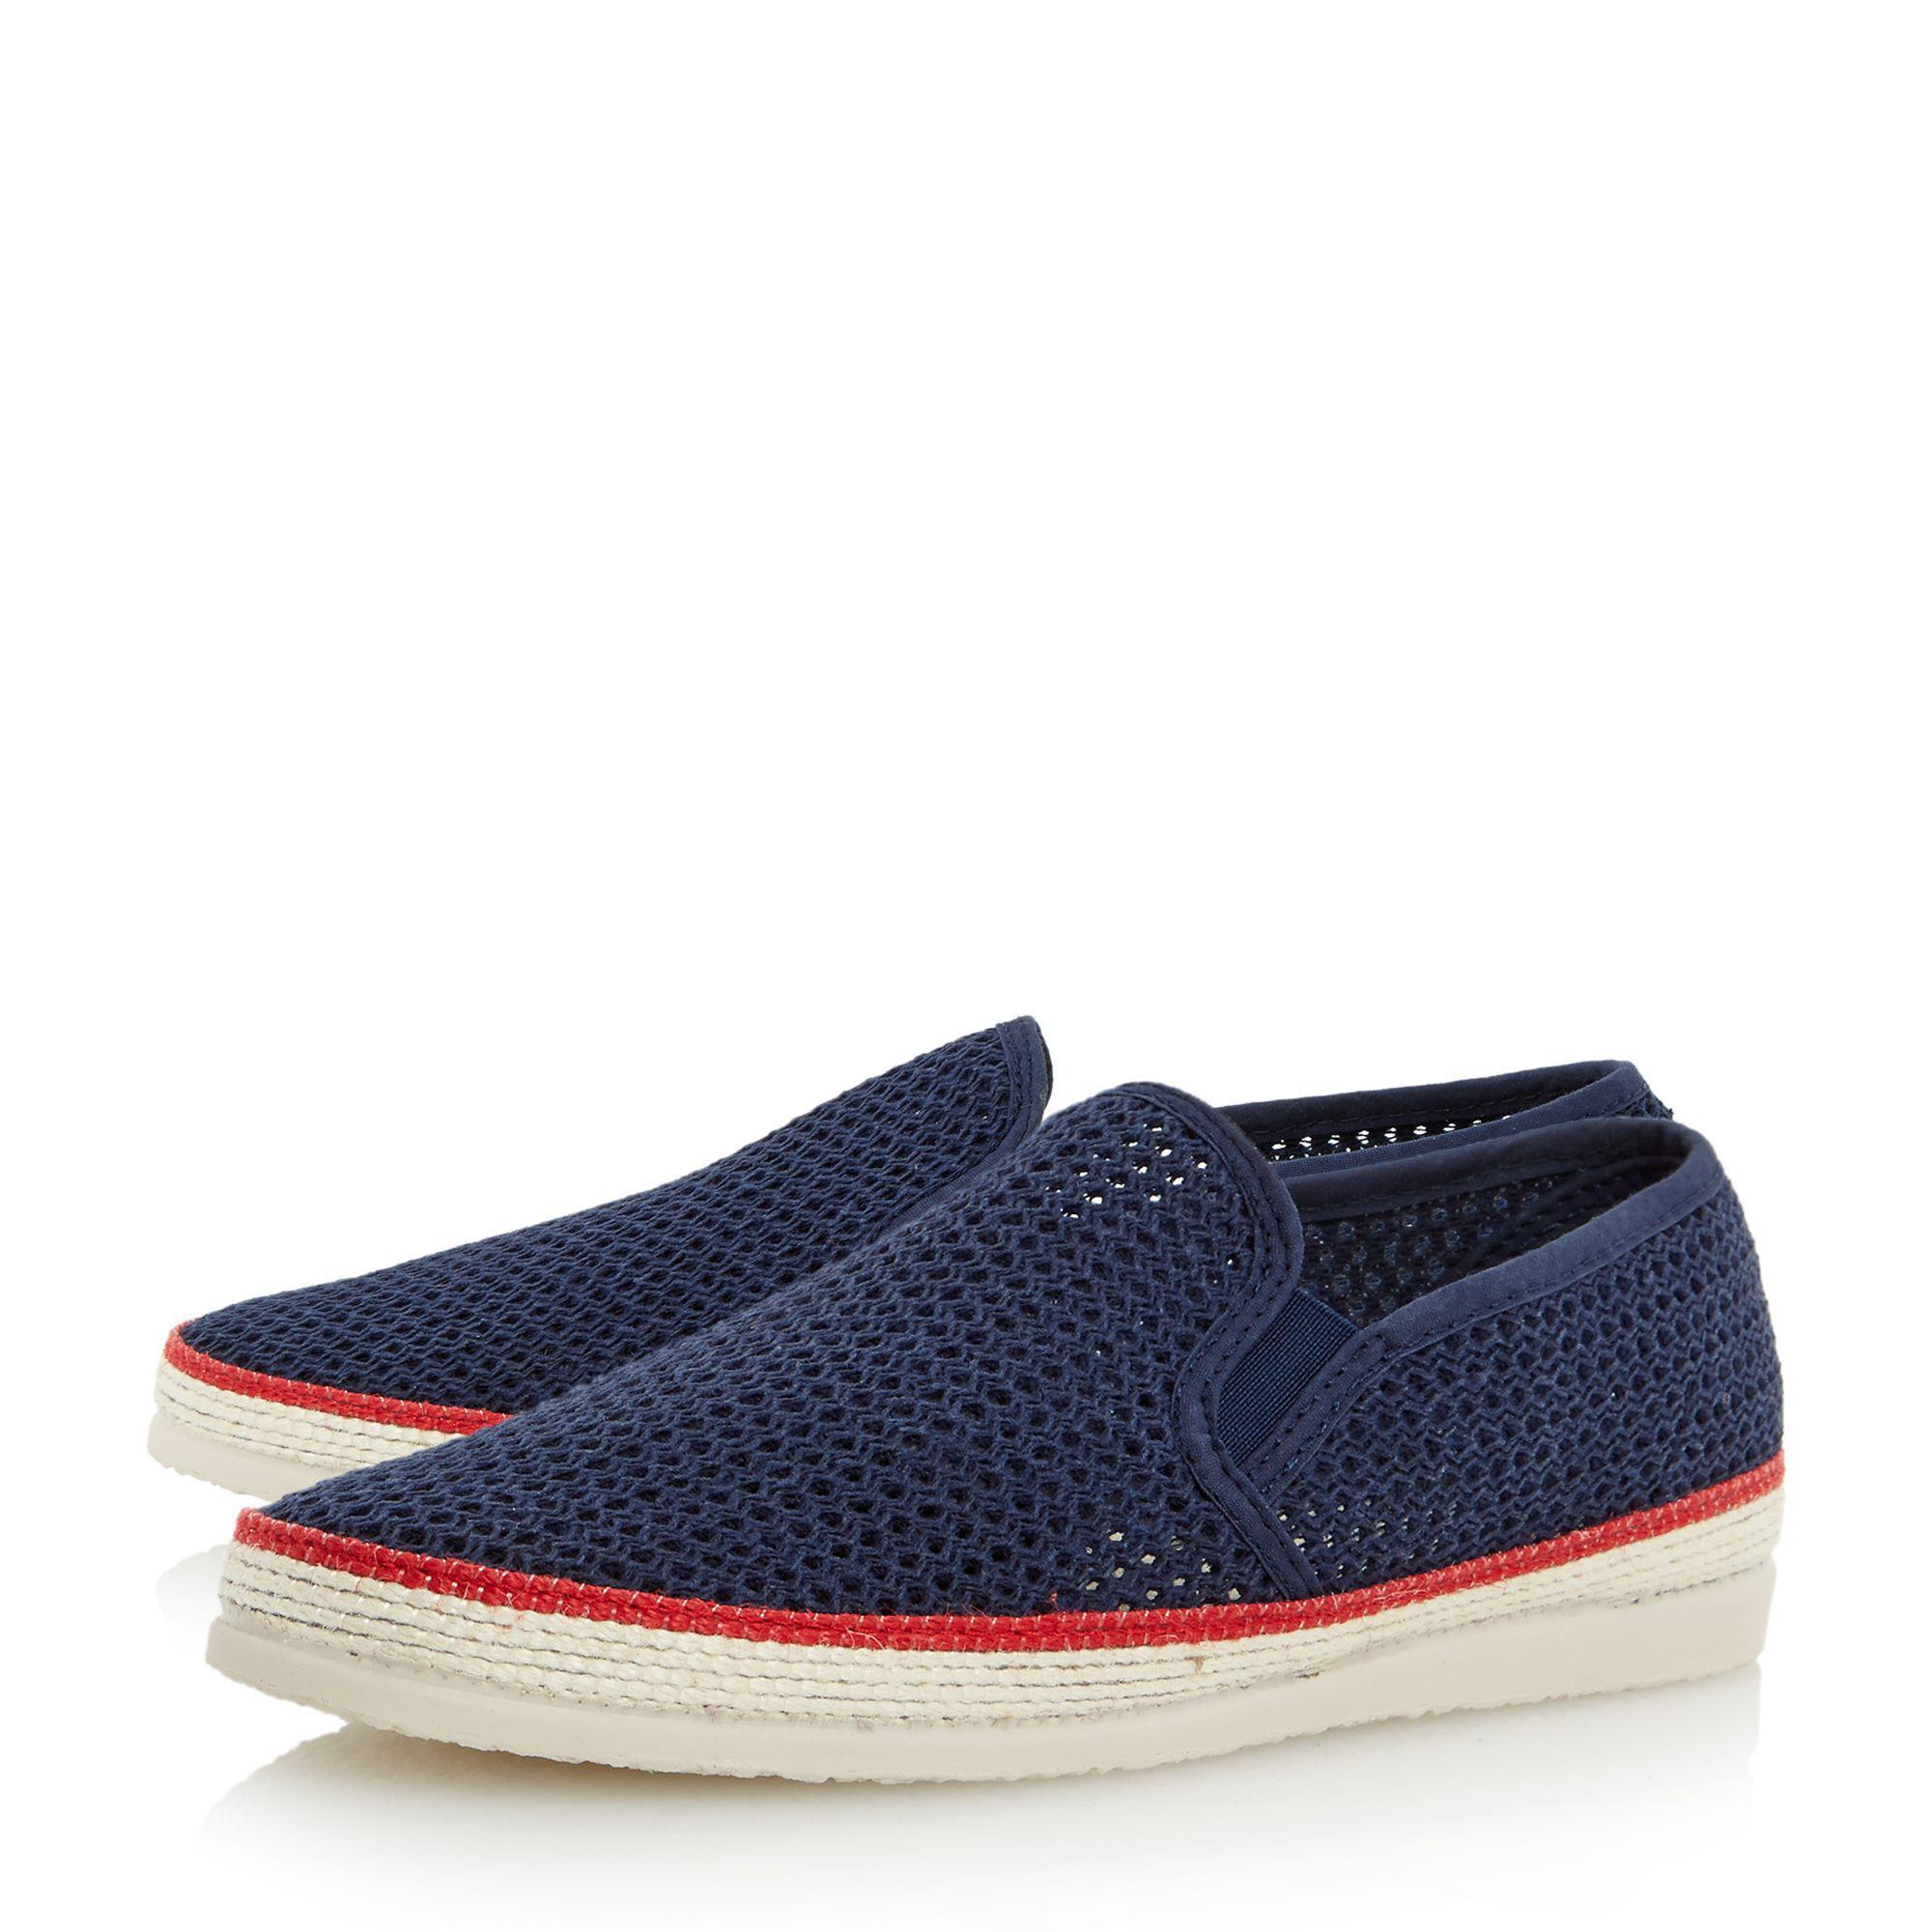 663ef353b Bertie - Blue Navy 'fresh' Mesh Detail Espadrille Shoe for Men - Lyst. View  fullscreen